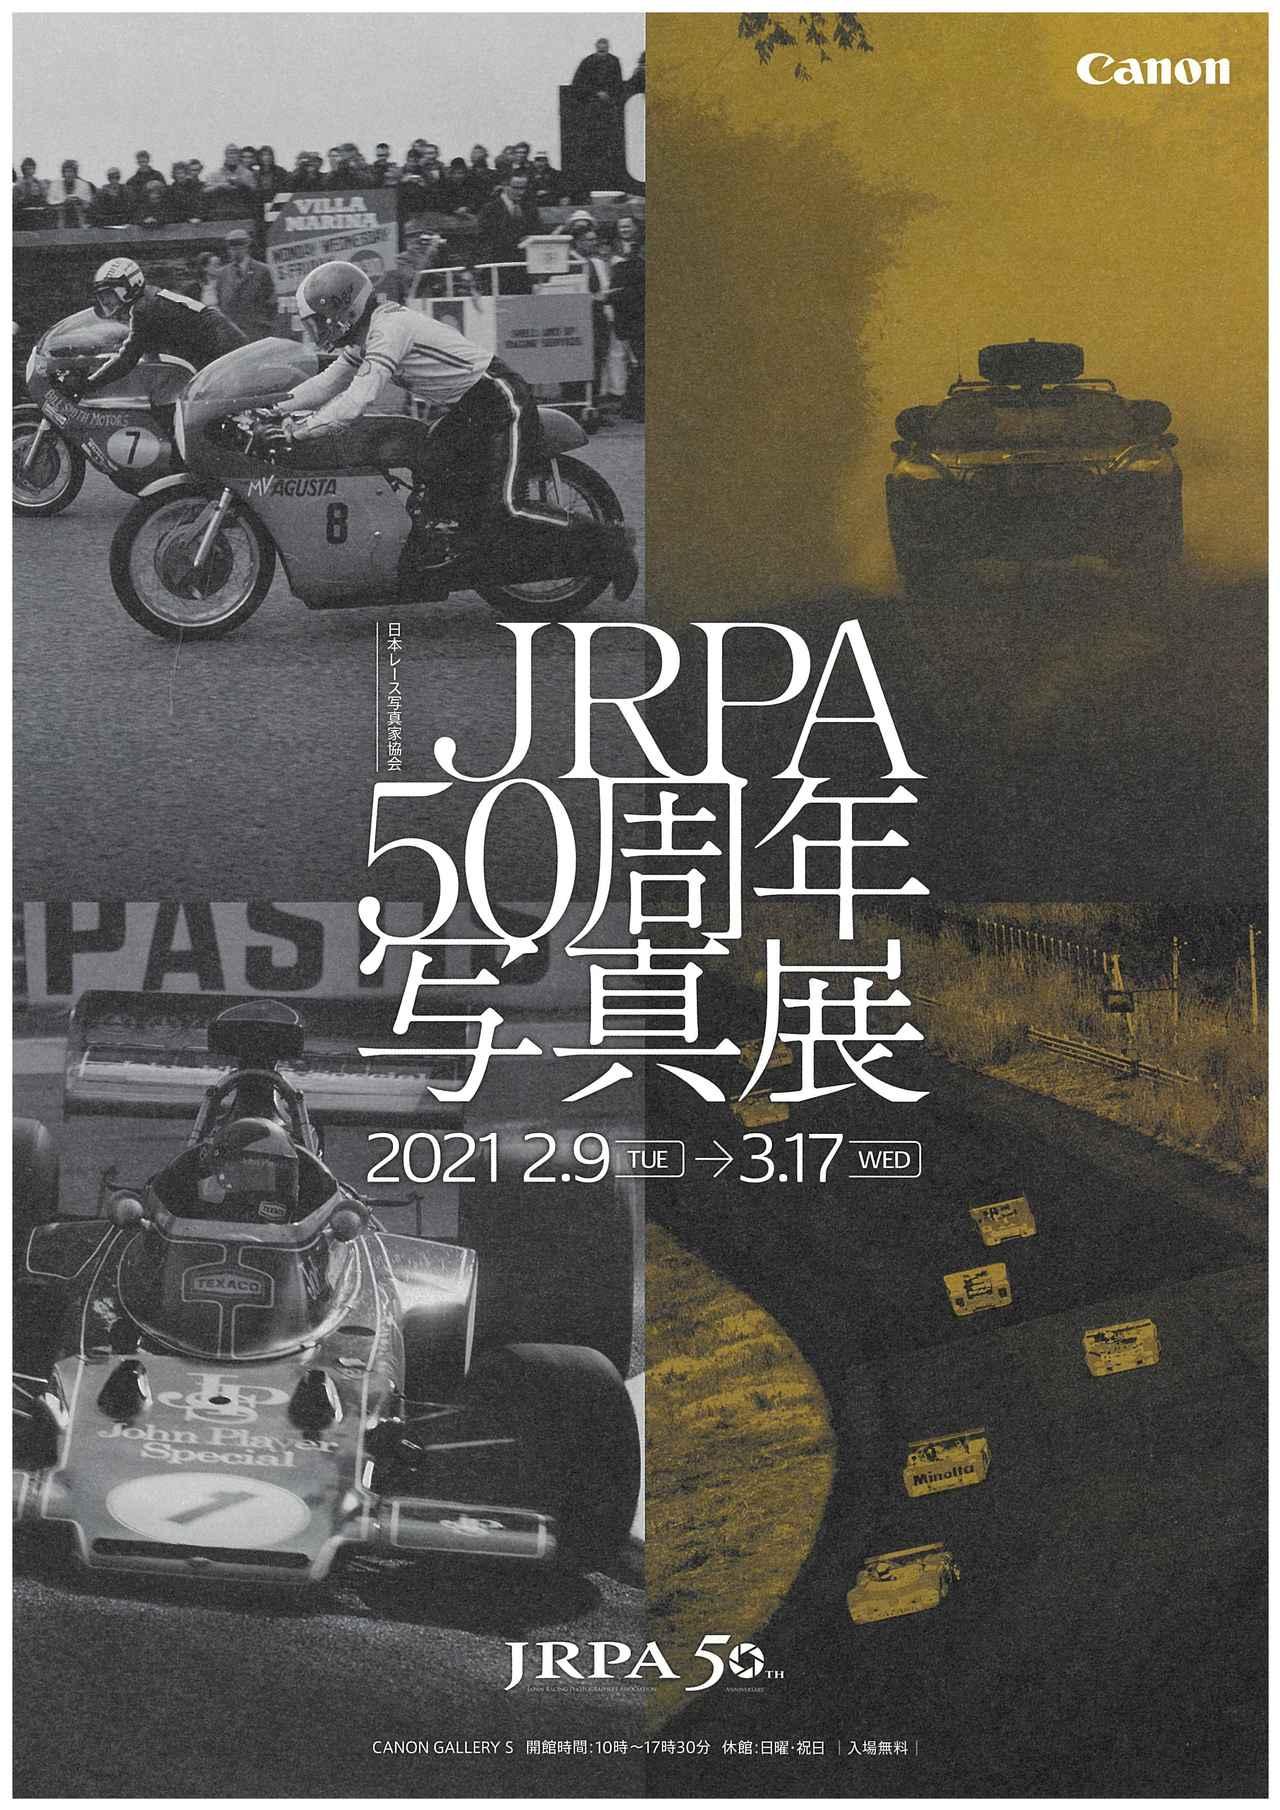 画像: 「JRPA50周年写真展」